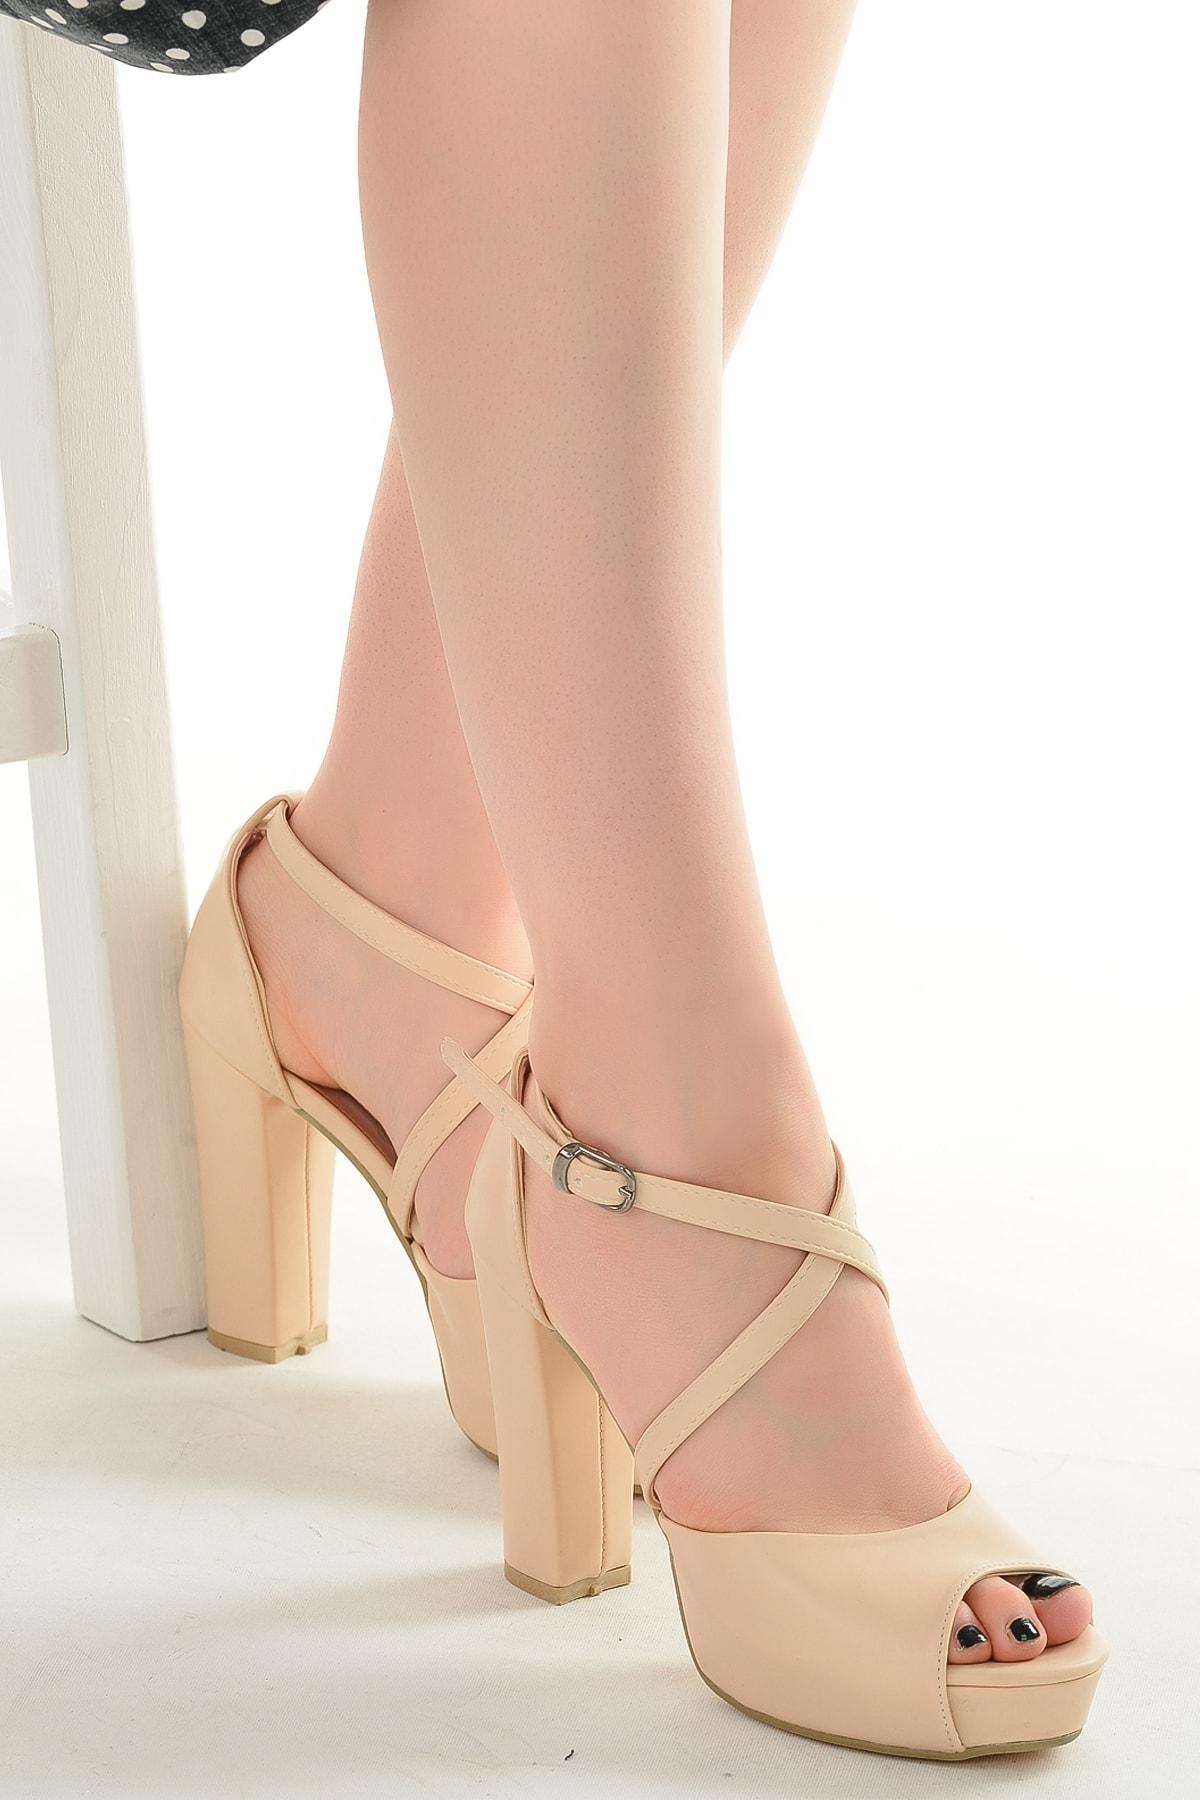 Ayakland Cilt Abiye 11 cm Platform Topuk Sandalet Ayakkabı 3210-2058 1